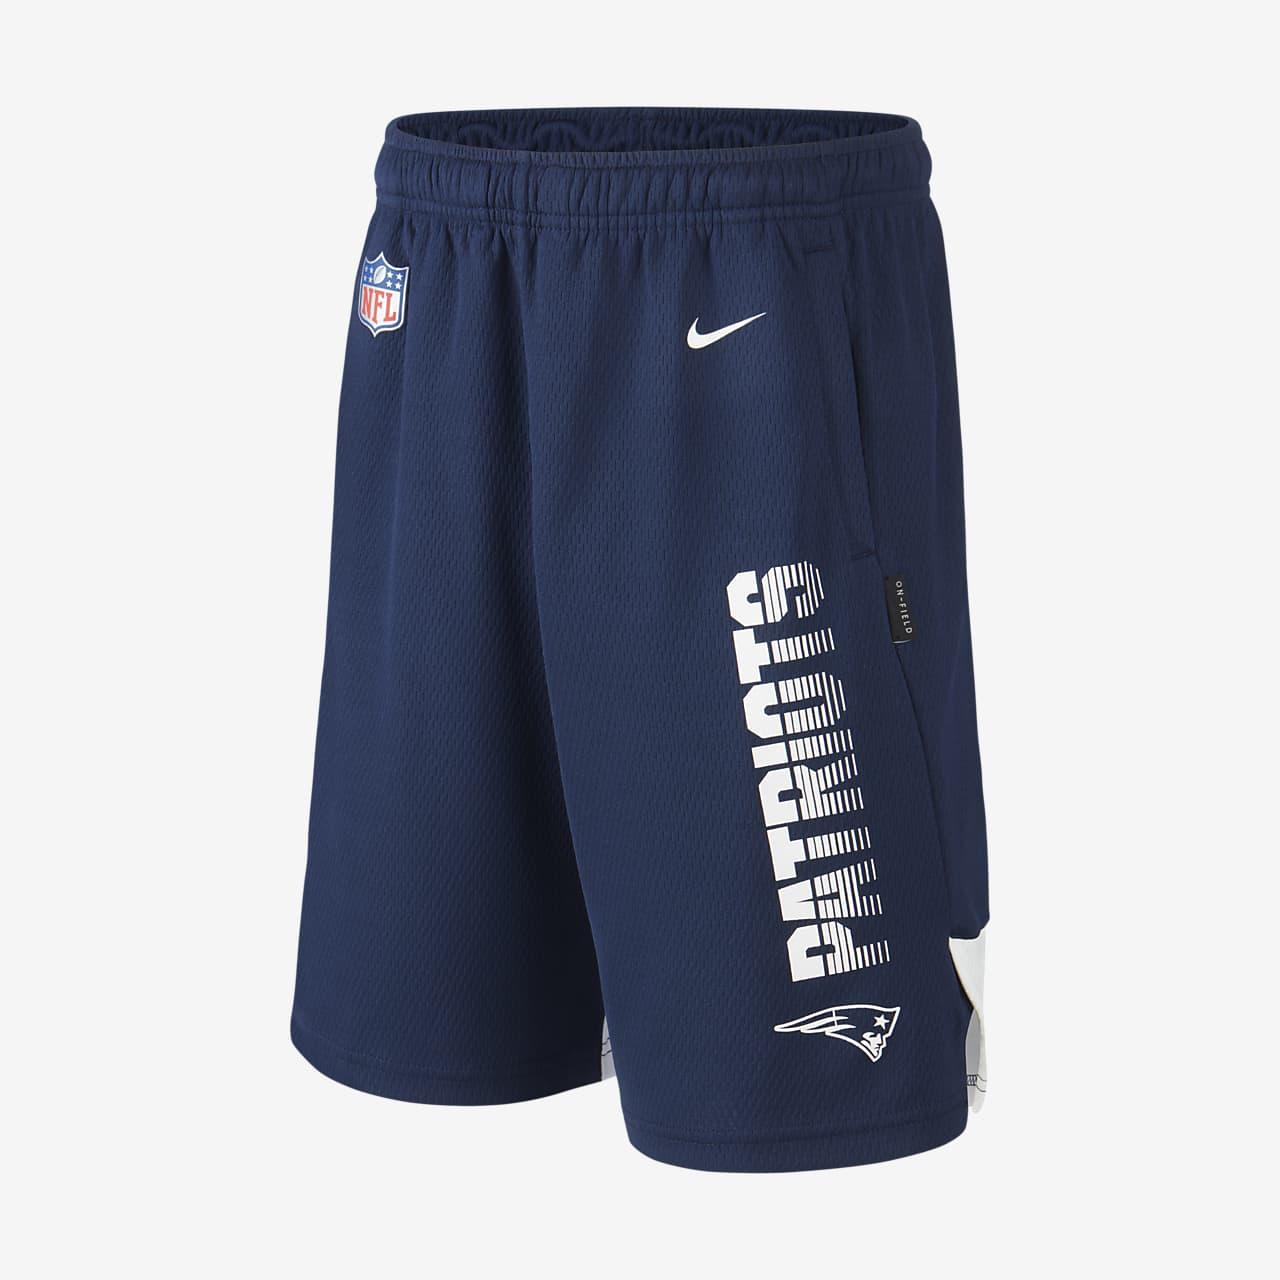 Nike (NFL Patriots) Kindershorts